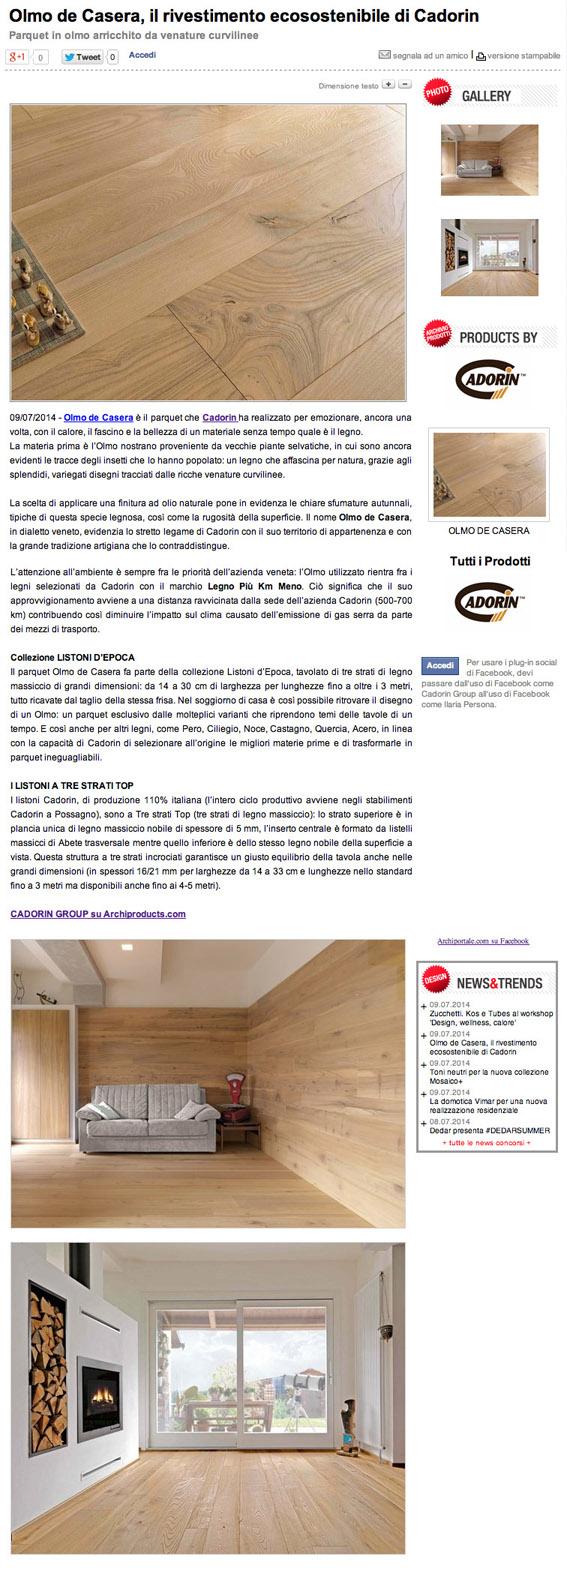 Insetti Bianchi Sul Parquet wooden parquet flooring decoration&design magazines july